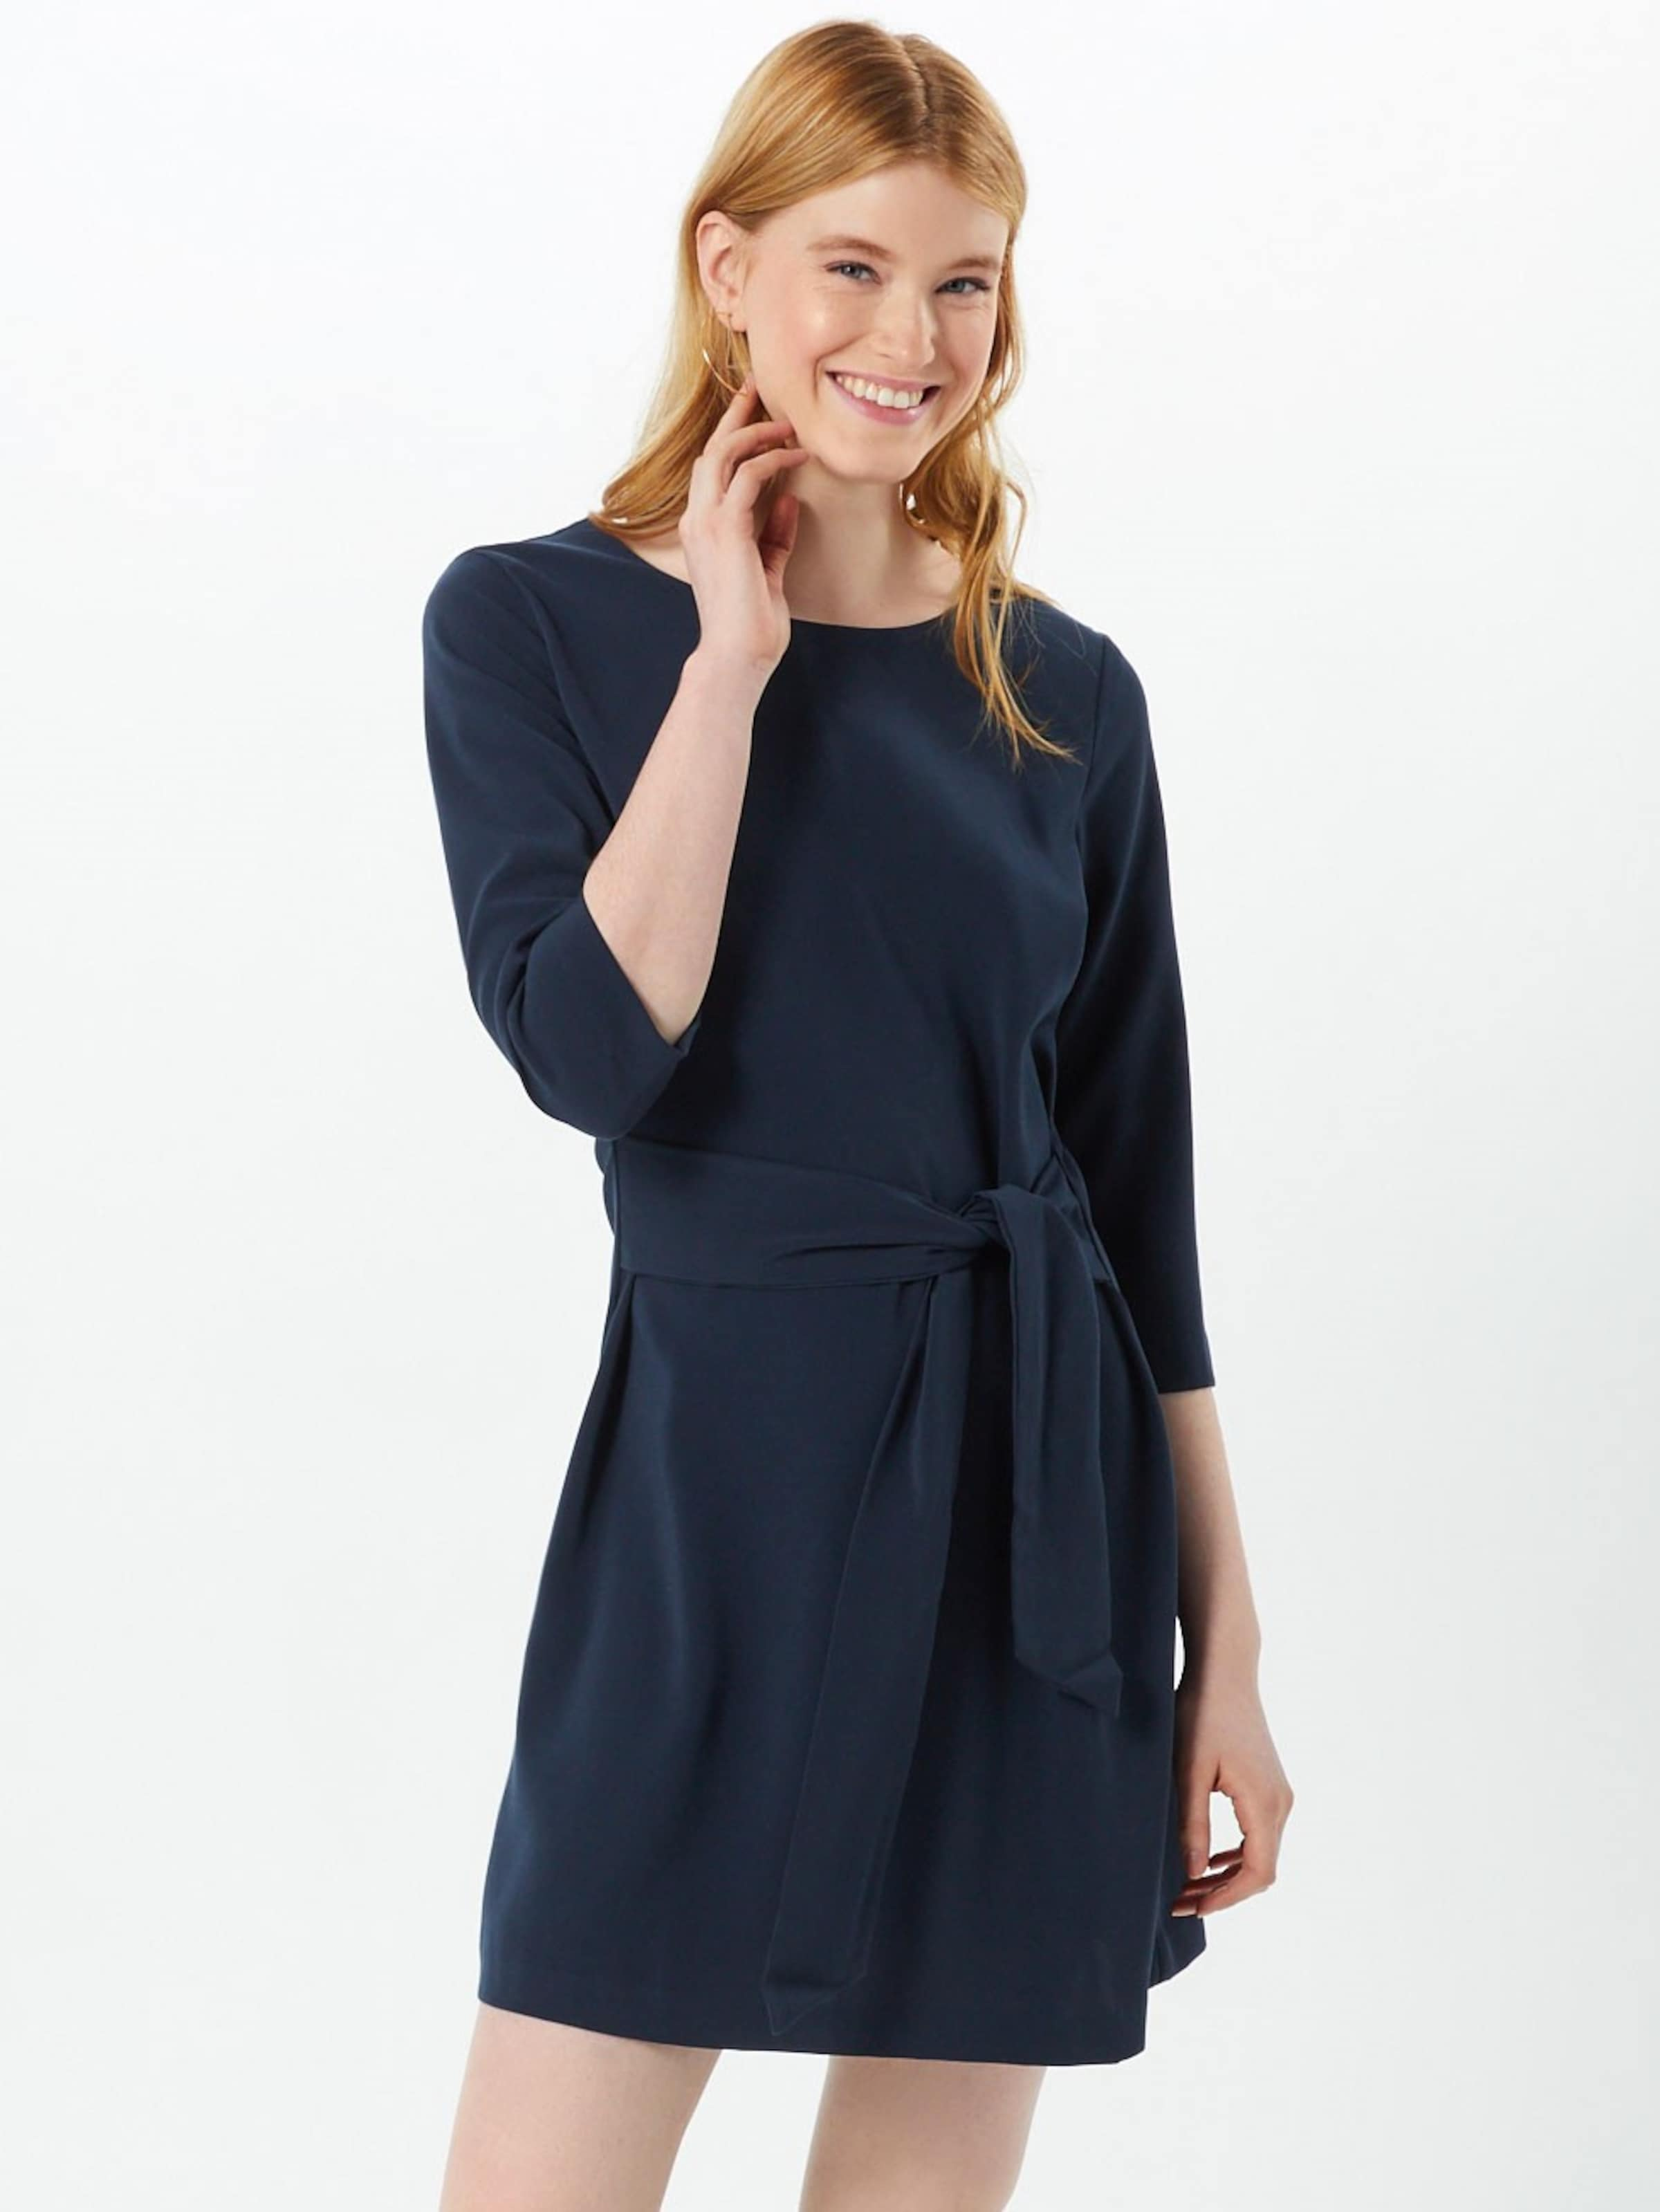 Vila 'nathalia' Vila Dunkelblau In Dunkelblau Kleid 'nathalia' In Kleid 'nathalia' Kleid Vila OkZuXiP